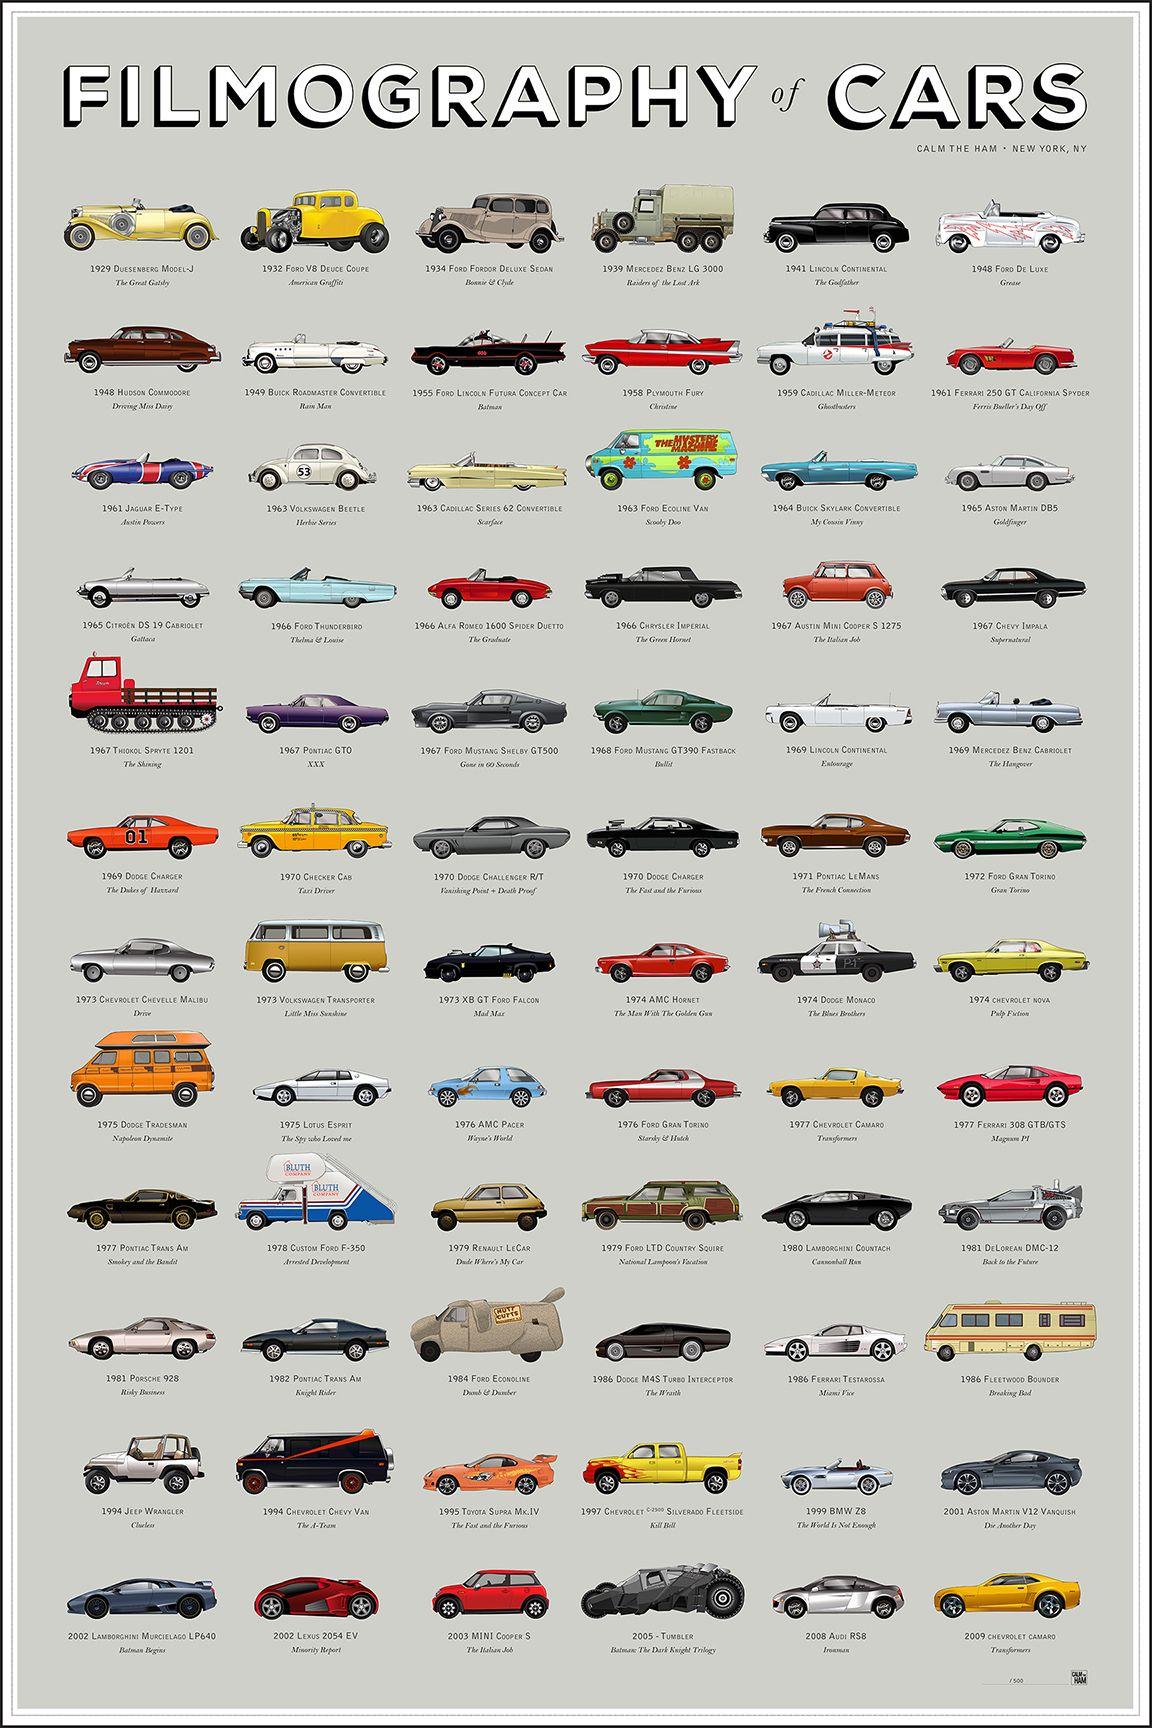 Muscle Cars In The Movies http://fandan.co/1Dmv8Agco/1Dmv8Ag ...